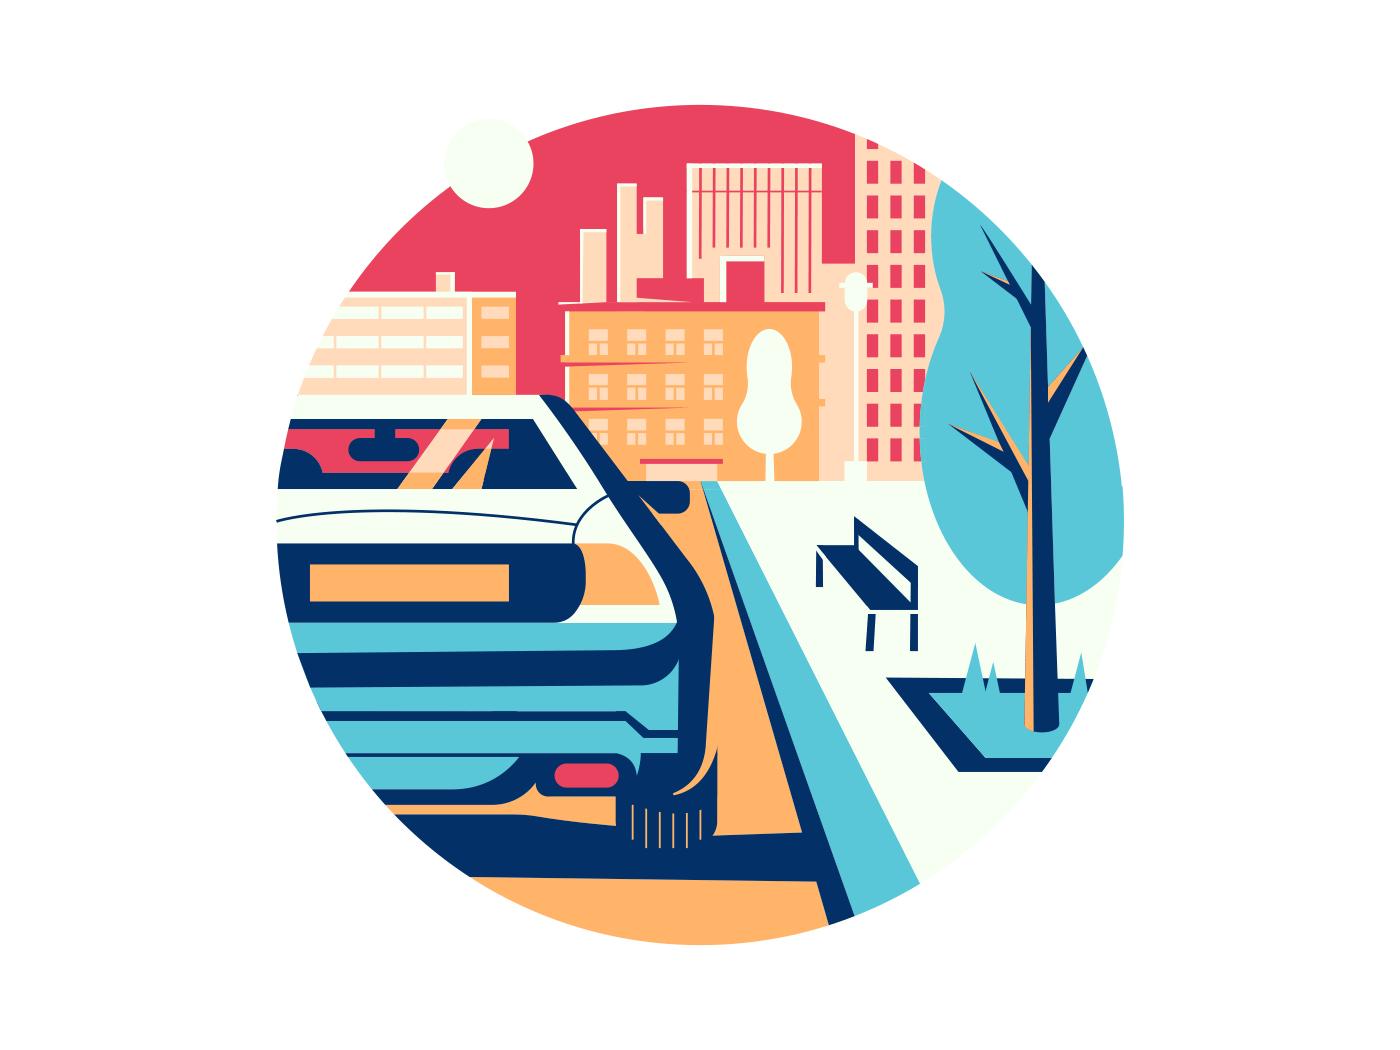 Car on road in city flat vector illustration